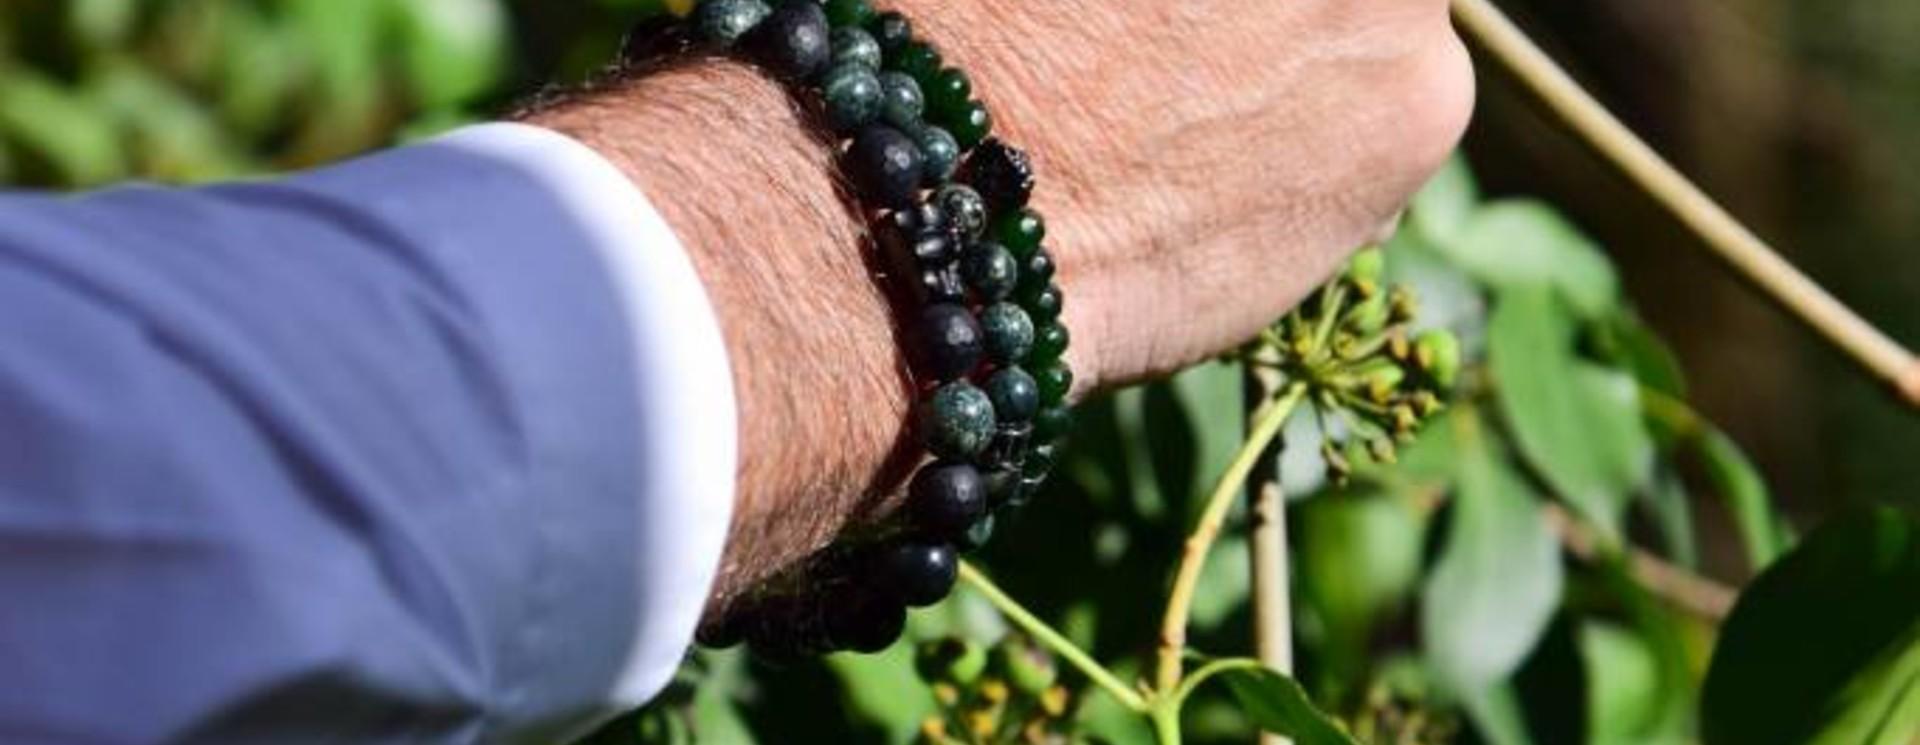 Heren Armband Groen